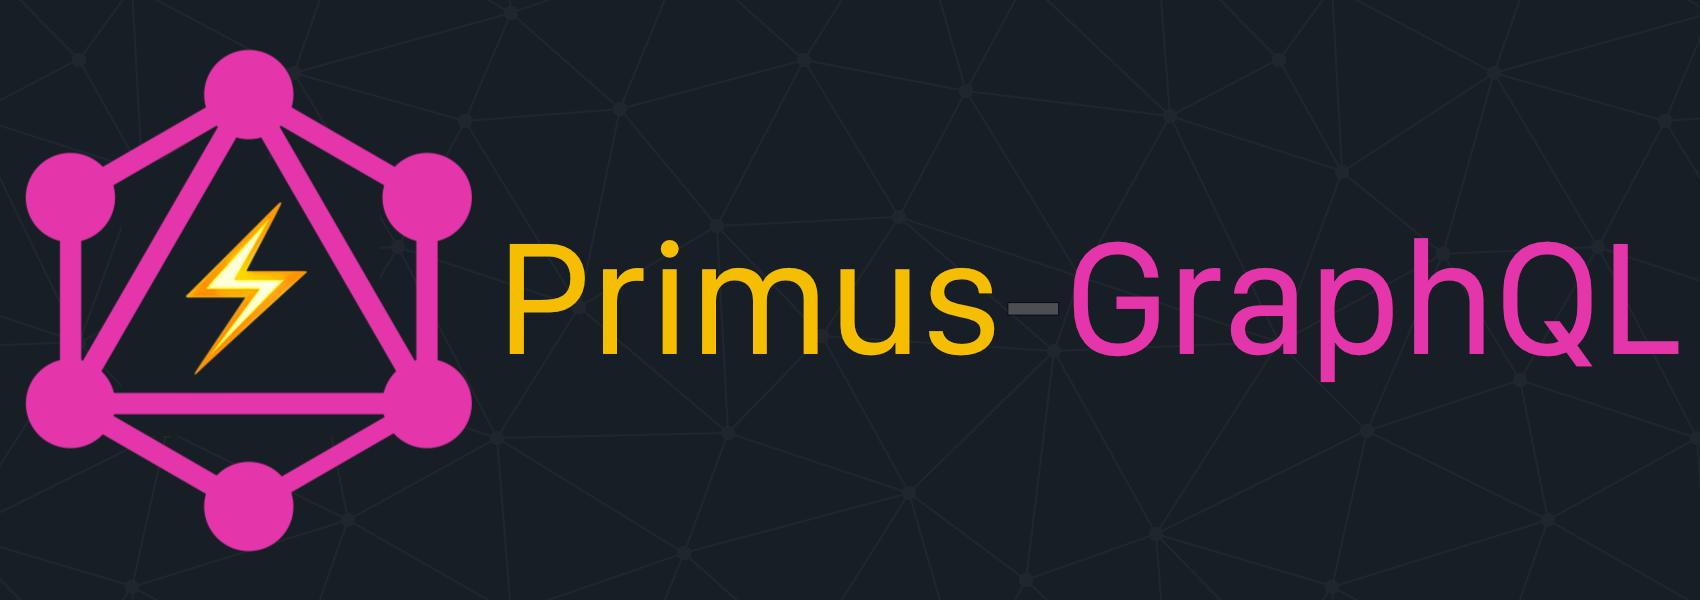 primus-graphql-logo